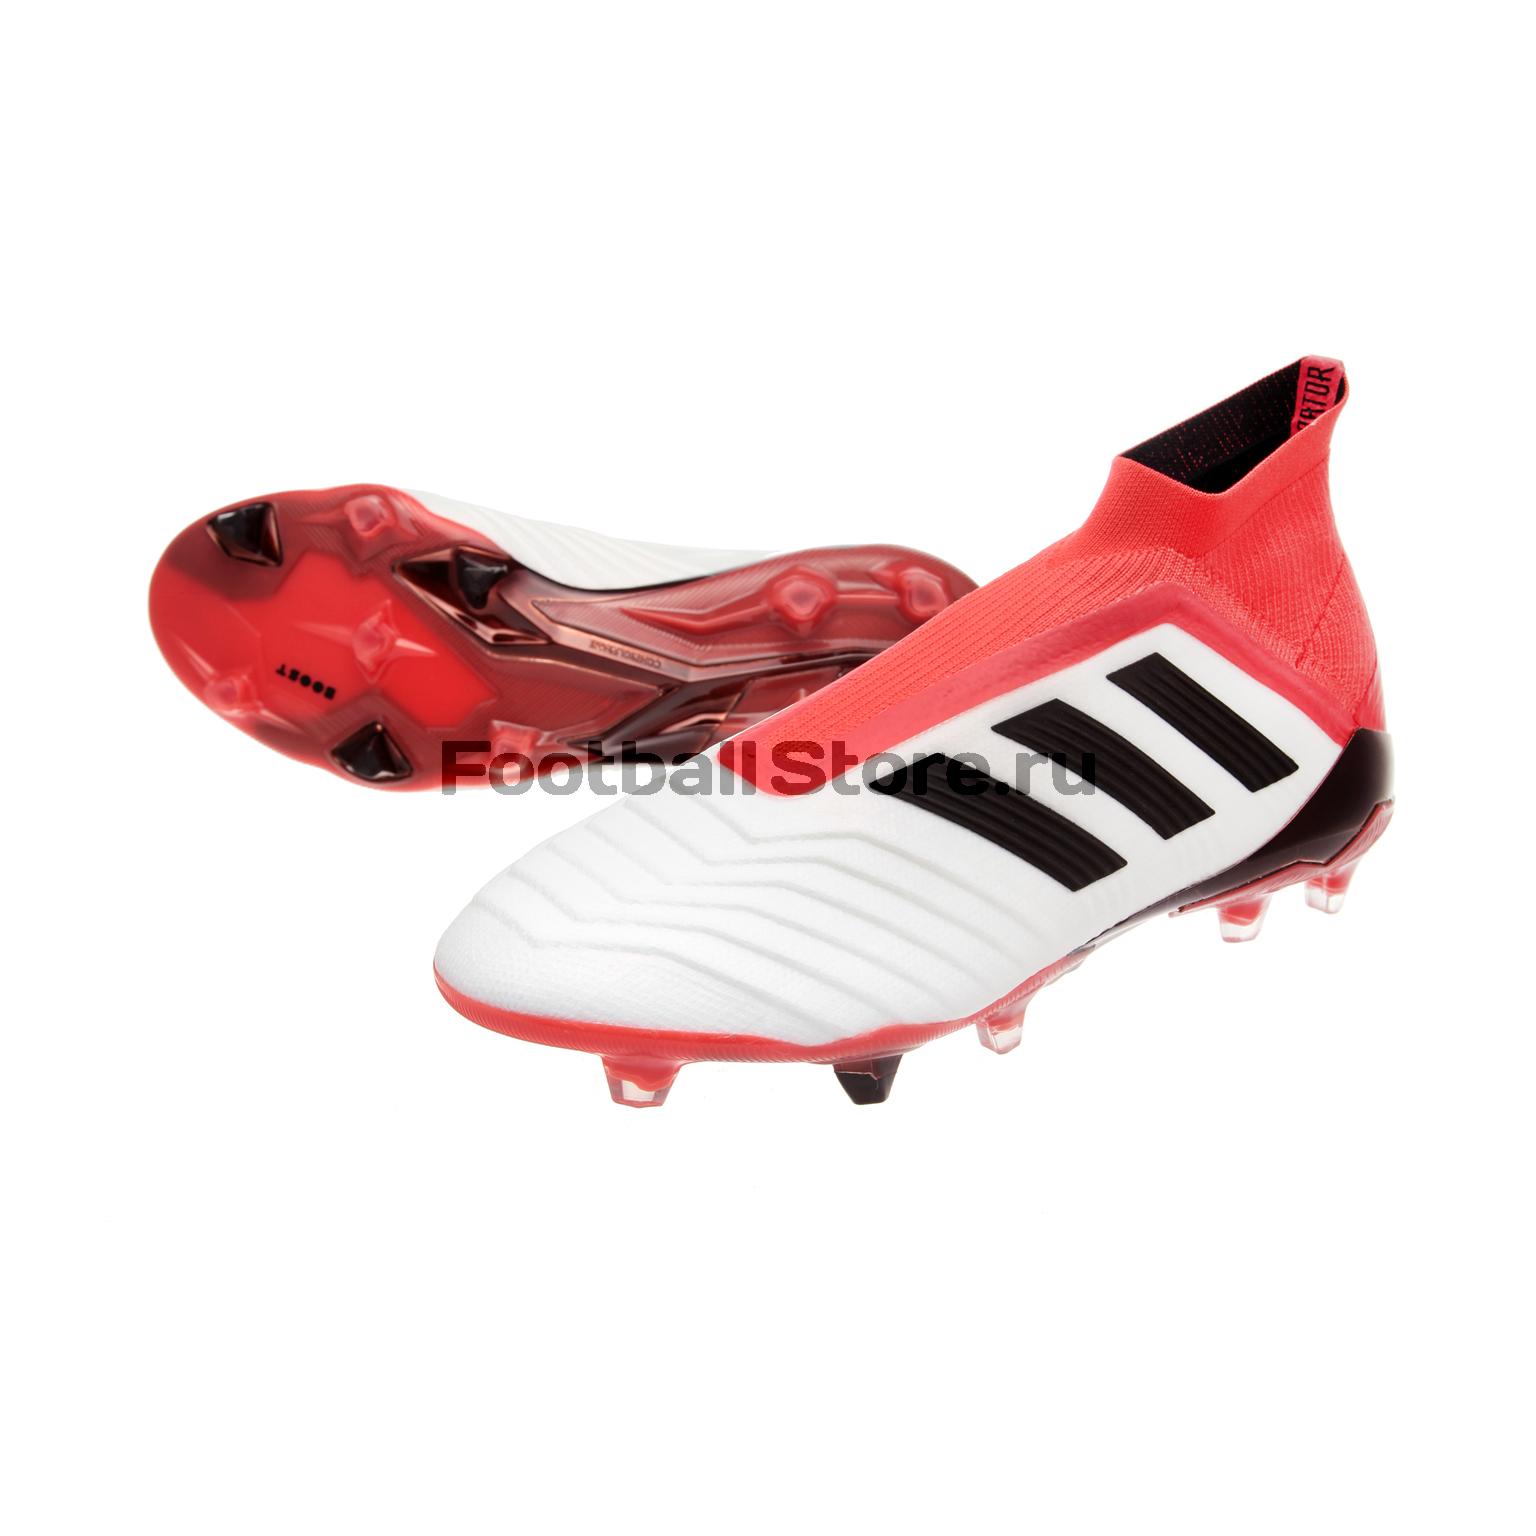 Бутсы Adidas Predator 18+ FG CM7391 adidas predator junior gk glove